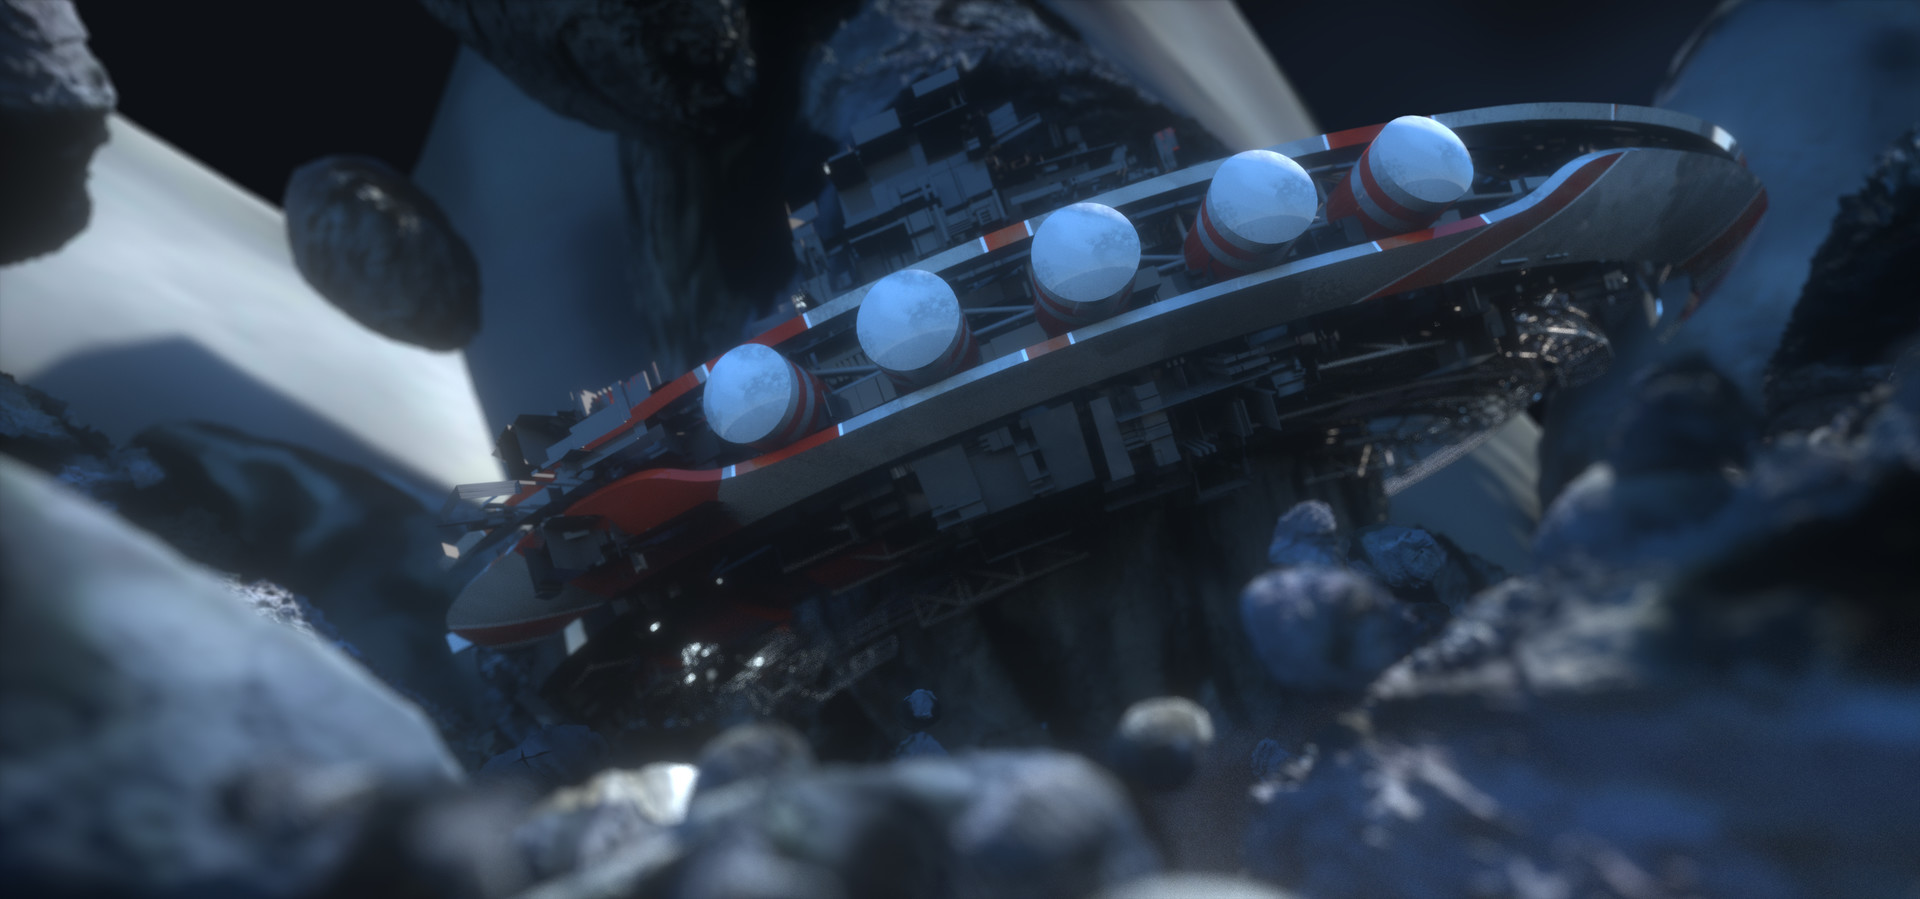 Leon tukker asteroidminingstepos3d